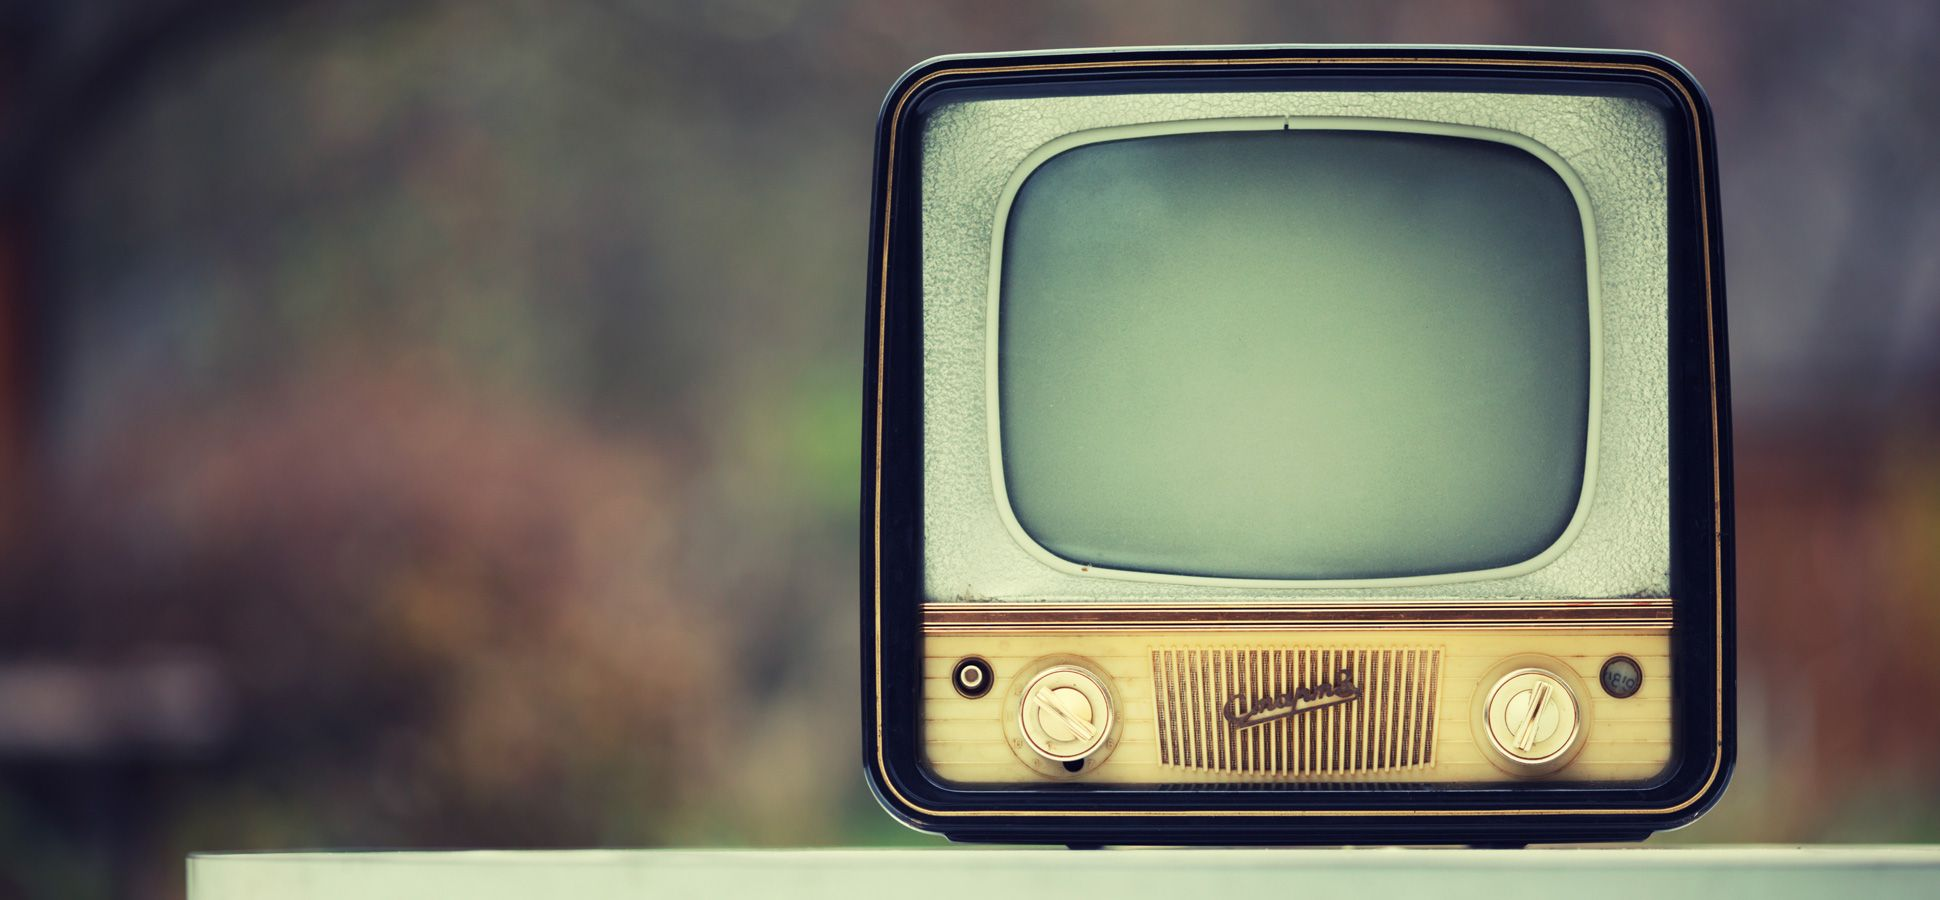 1940x900 Vintage Tv Wallpaper 8234 Thumb